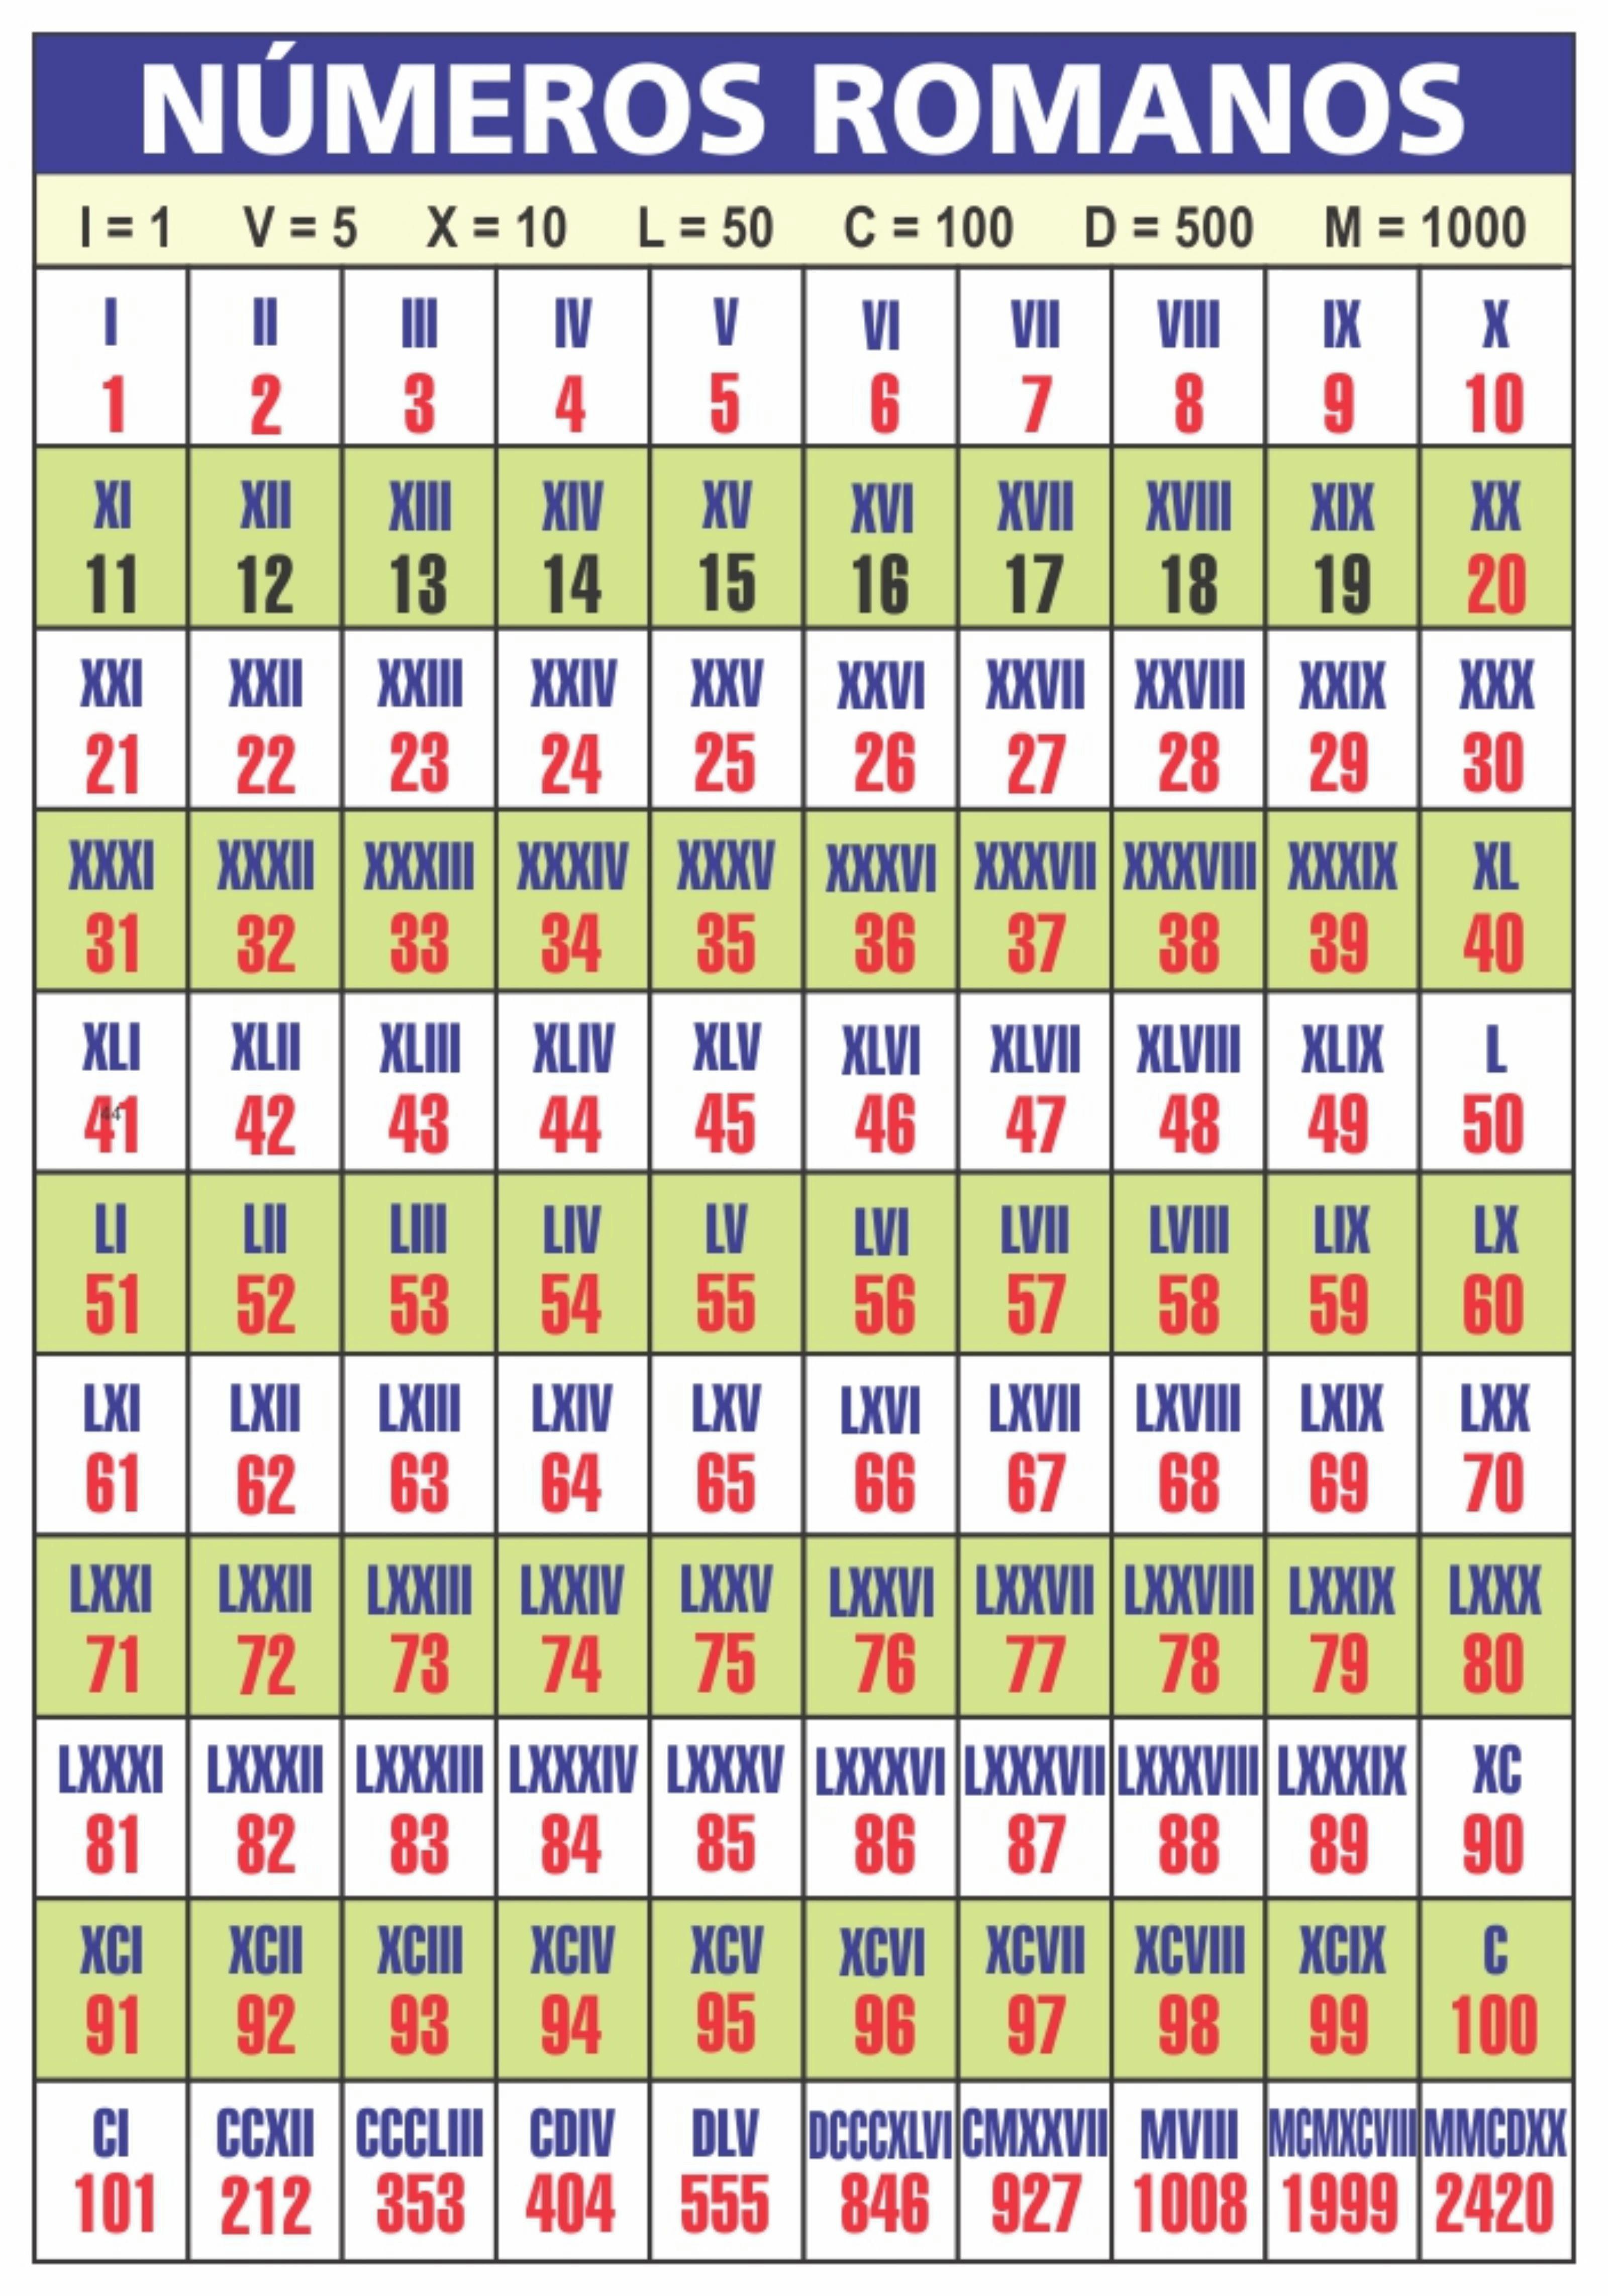 Data Em Numeros Romanos painel banner escolar números romanos - 100x070mt